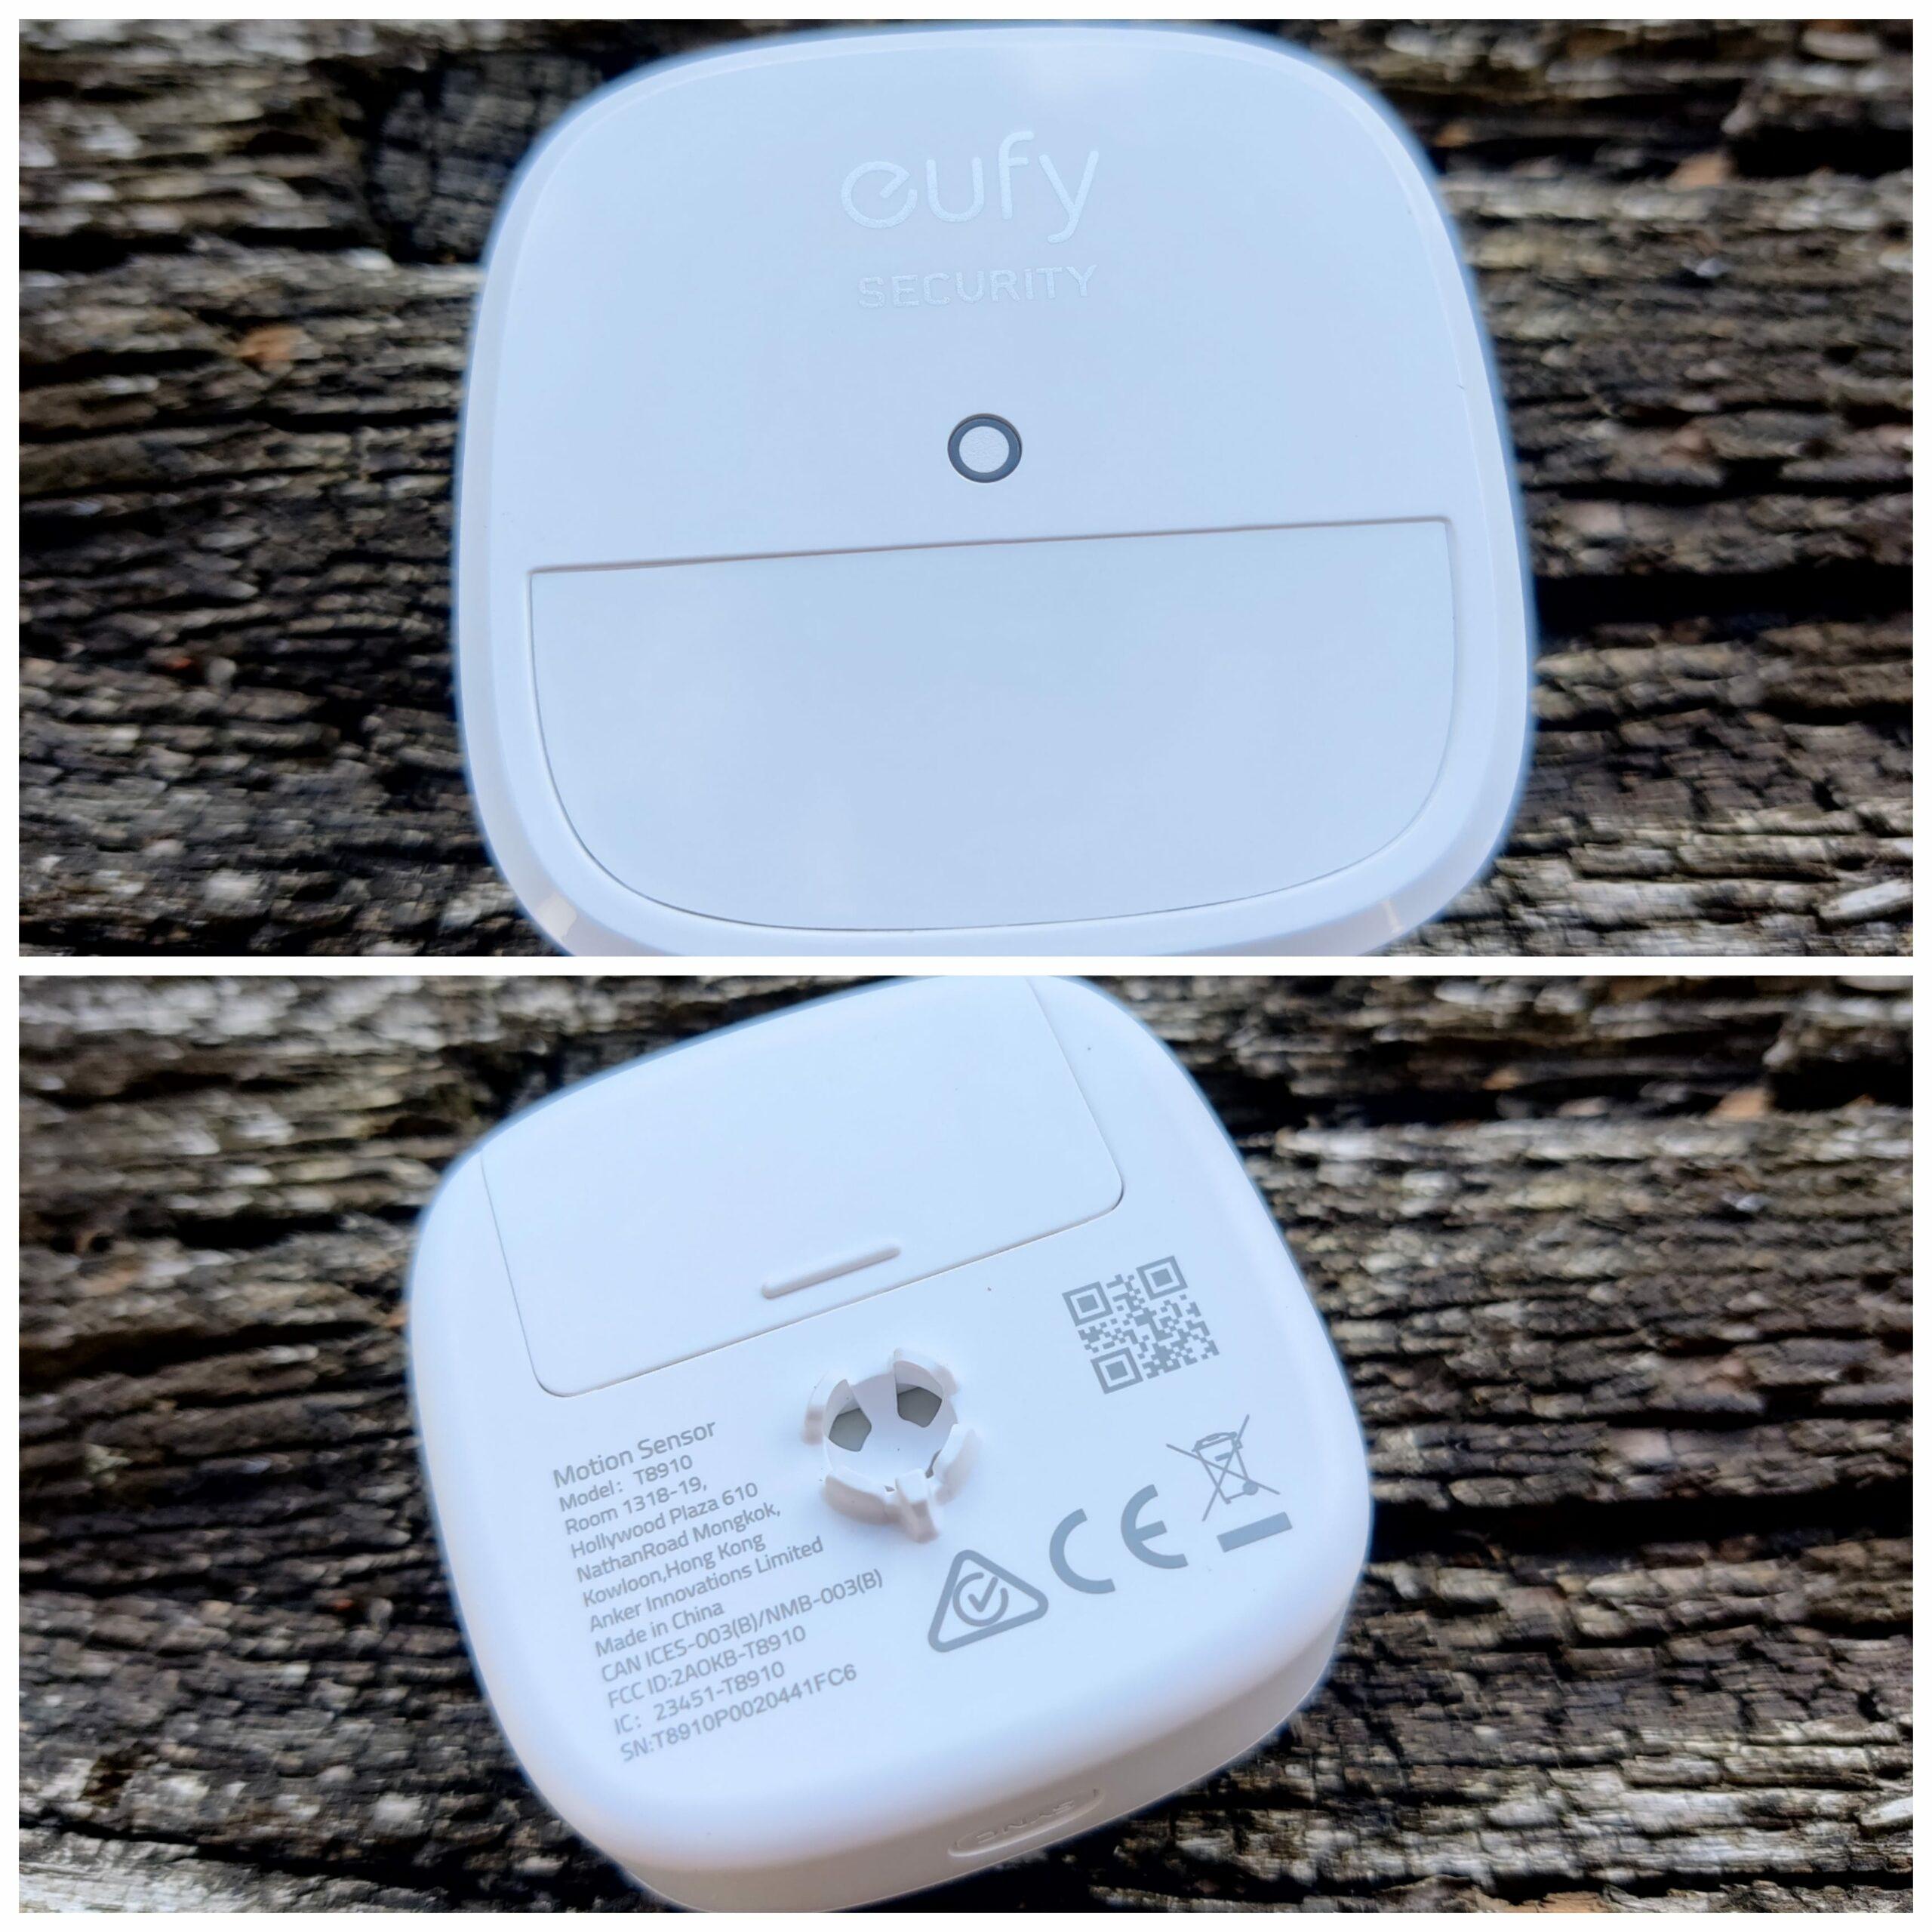 Eufy Security Kit alarme motion sensor